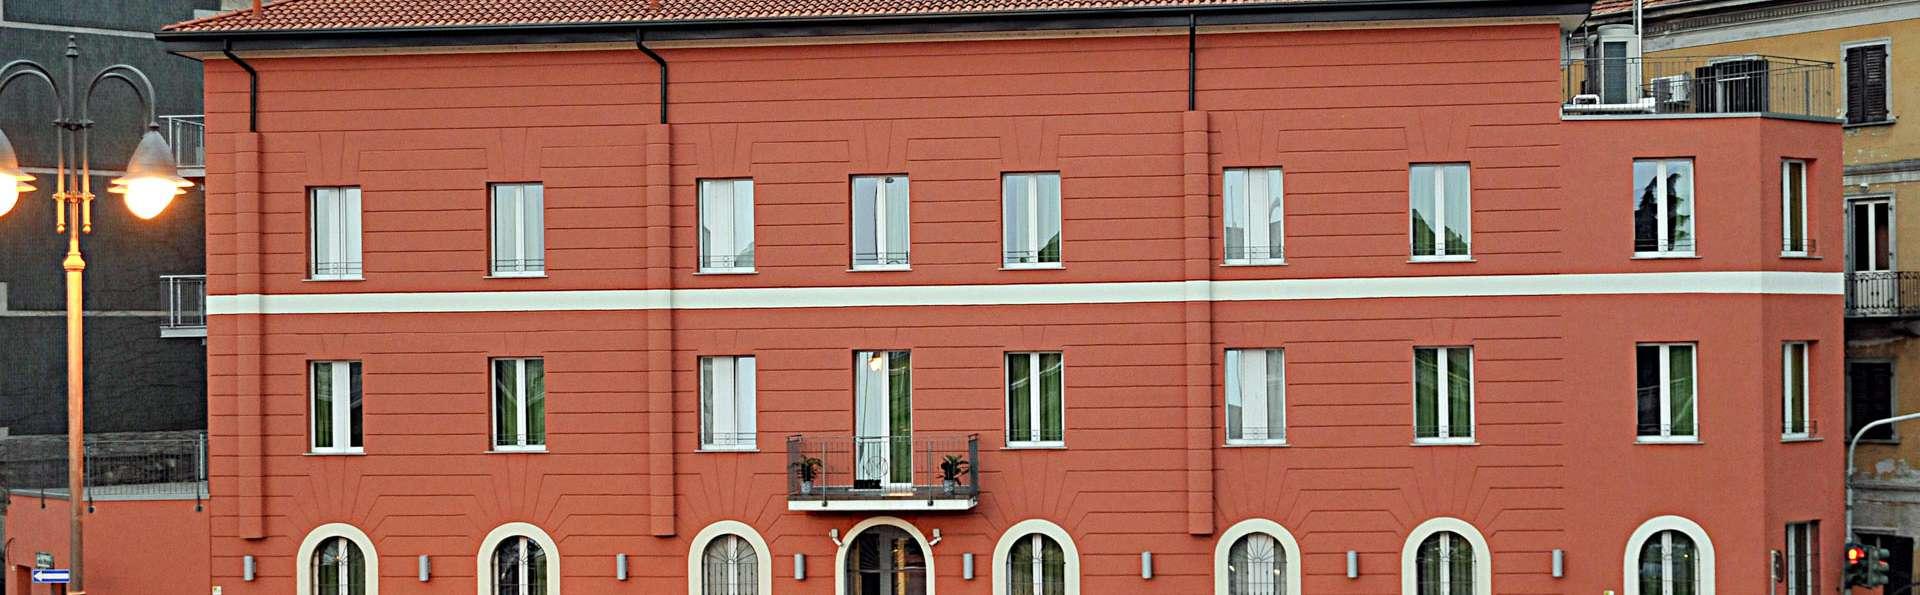 Hotel Residence Matteotti - EDIT_NEW_FRONT_01.jpg